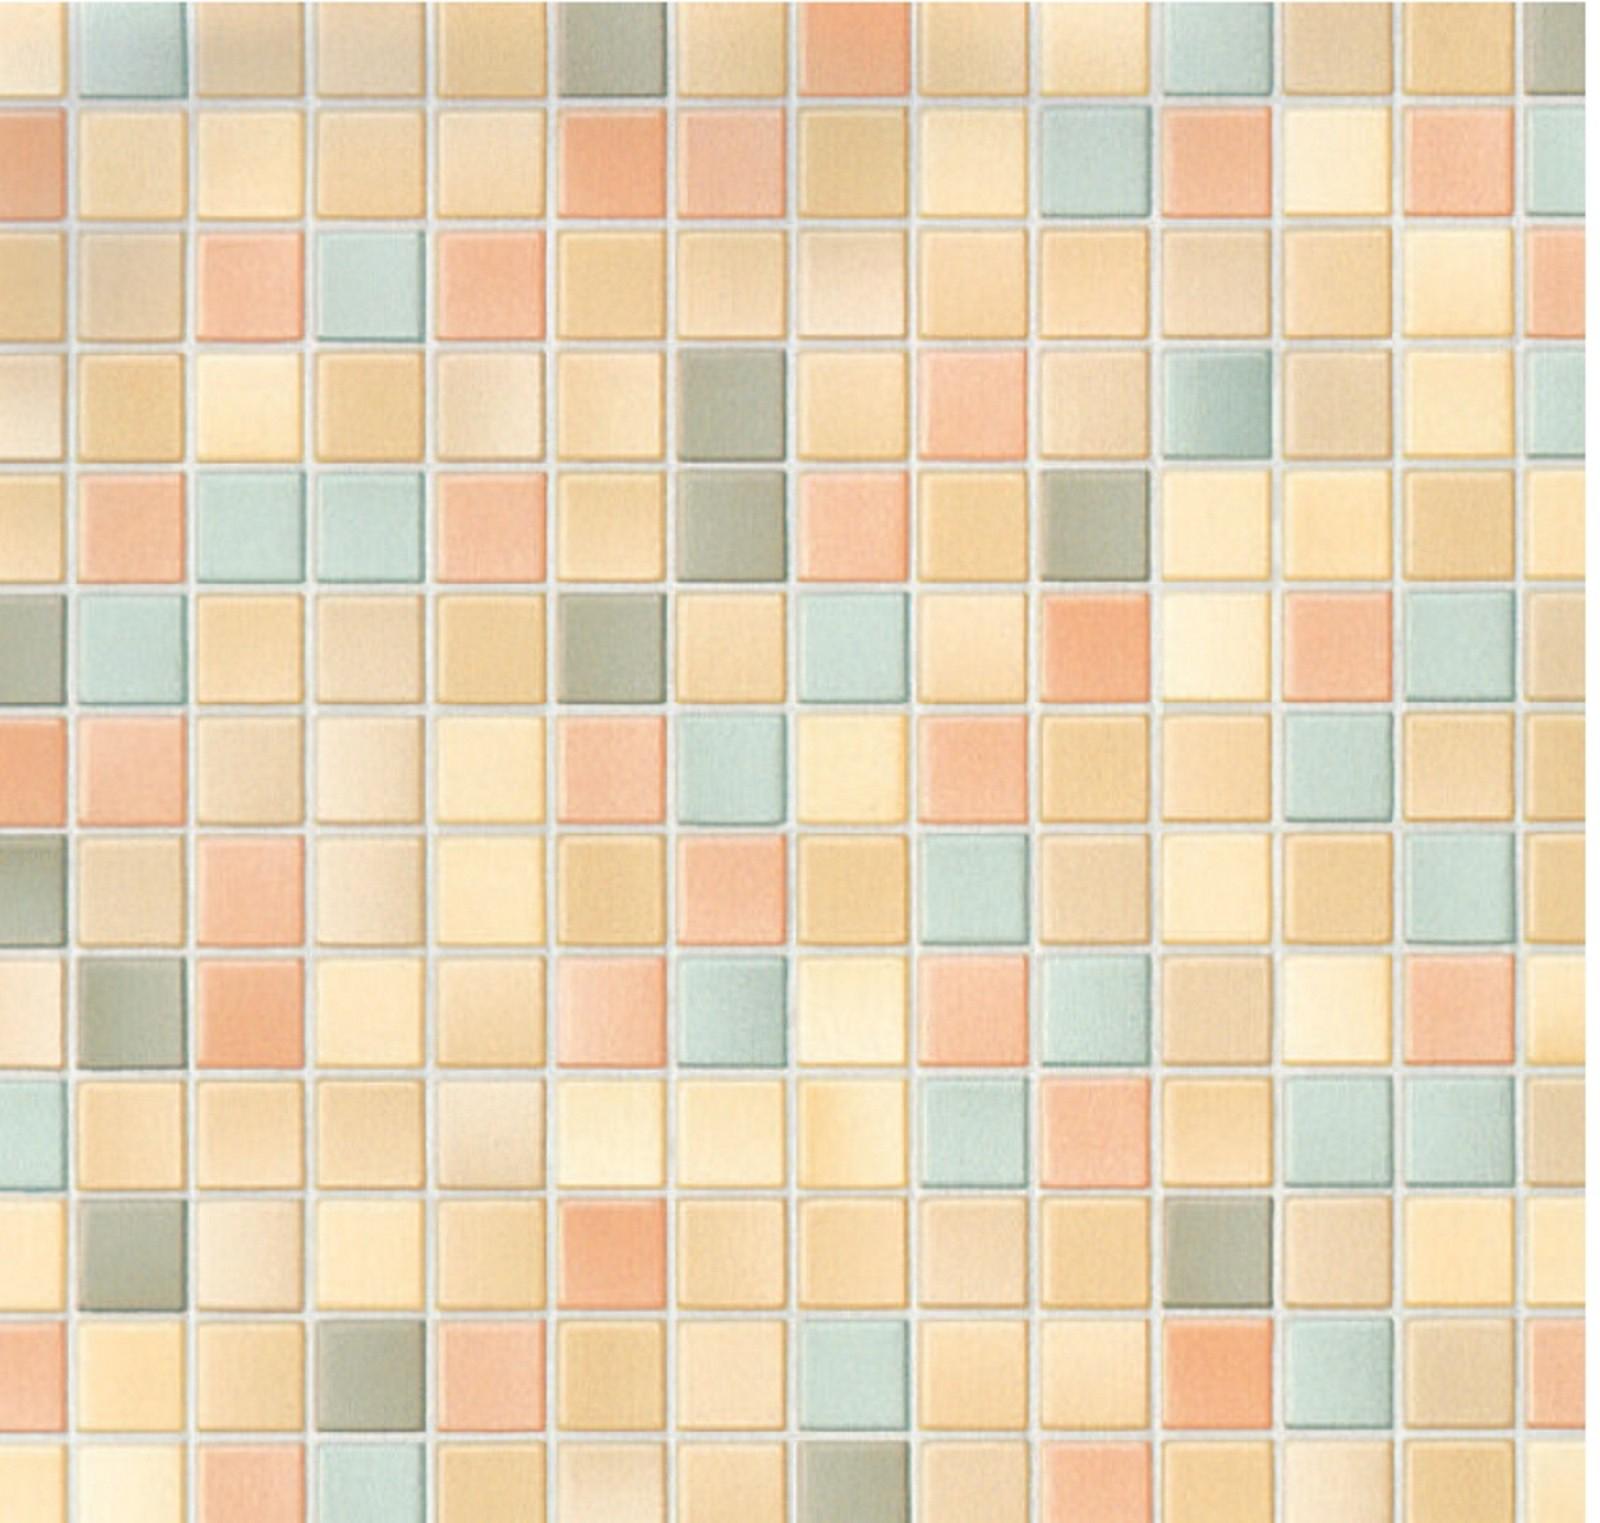 Klebefolie mosaik muster - Bunte kuchenfliesen ...